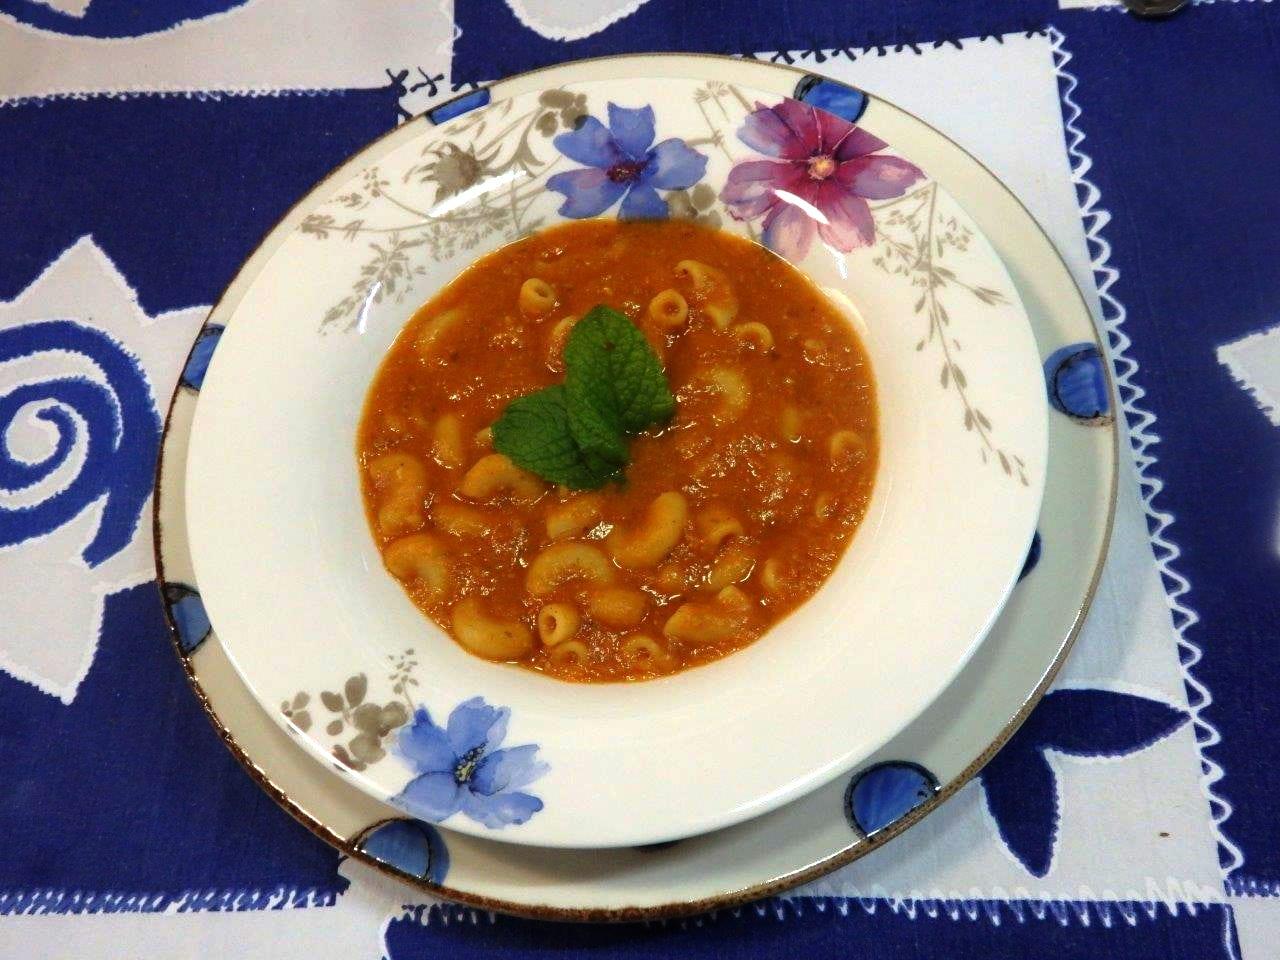 Sopa de Lulas sopa de lulas Sopa de Lulas Sopa de Lulas 2